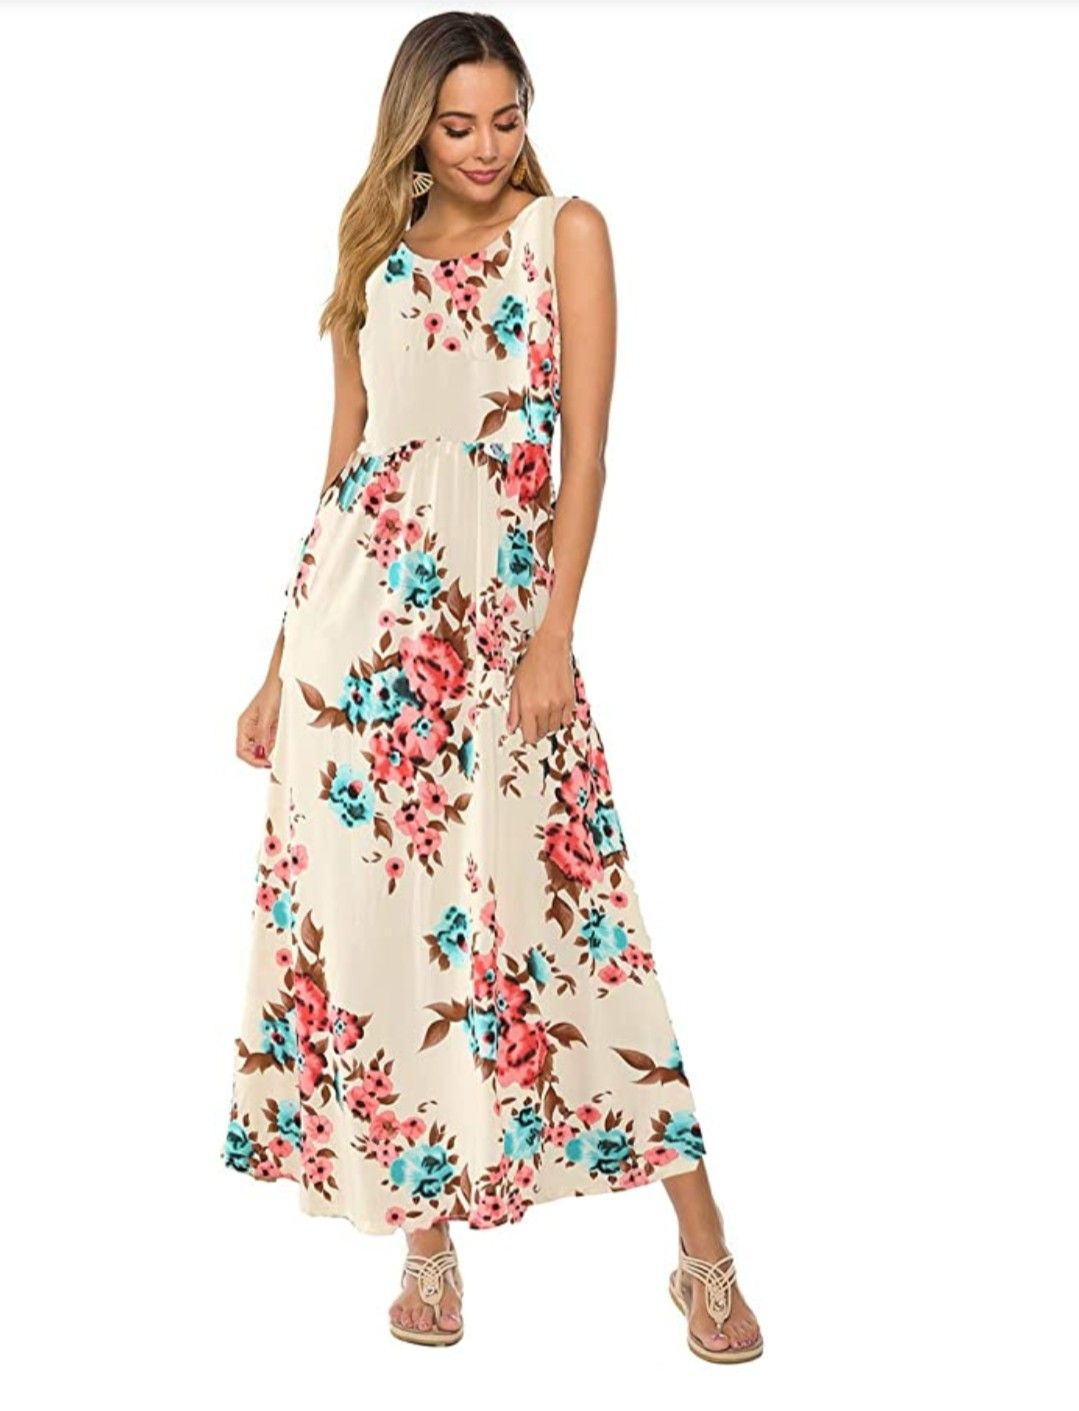 Dunea Women S Maxi Dress Floral Printed Autumn 3 4 Sleeve Casual Tunic Long Maxi Dress Womens Maxi Dresses Long Maxi Dress Floral Maxi Dress [ 1411 x 1079 Pixel ]